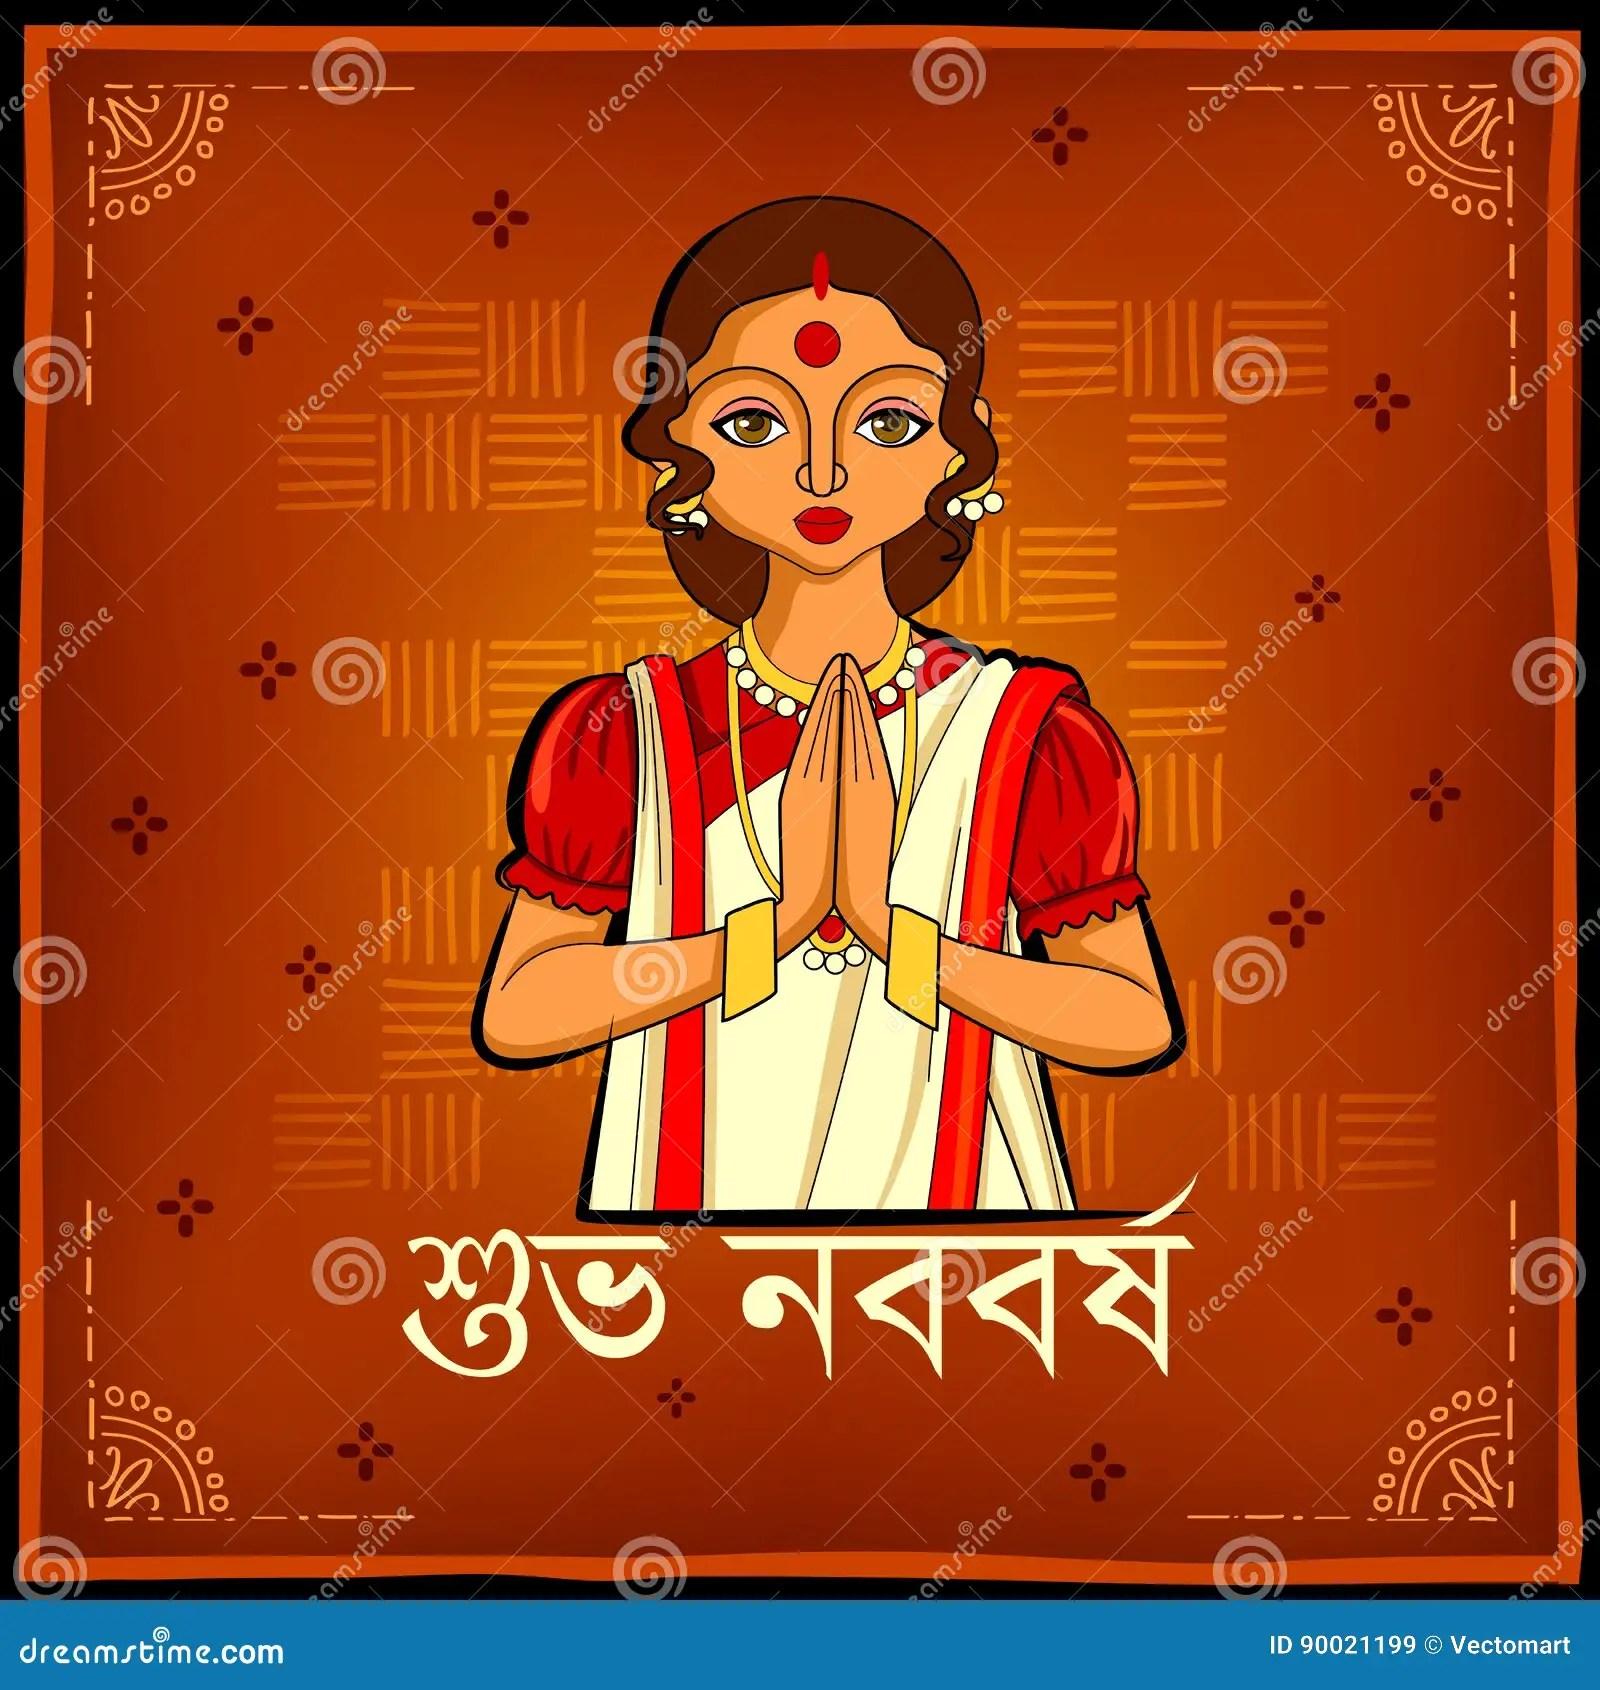 Greeting Background With Bengali Text Subho Nababarsho